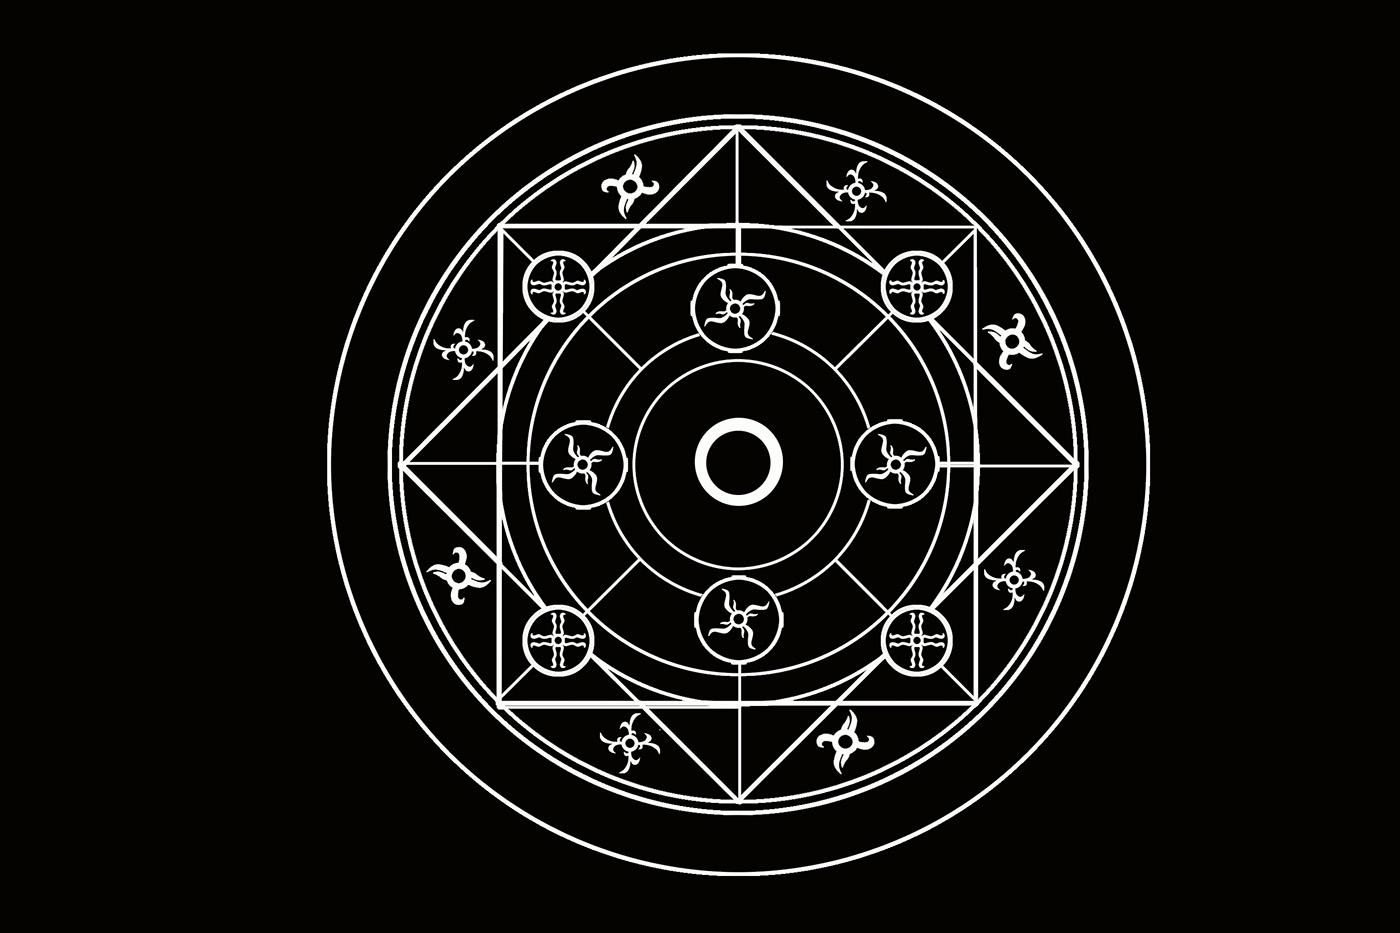 Encantadia 2016 the devas symbols on behance devas circle essence origin destruction and rebirth biocorpaavc Gallery